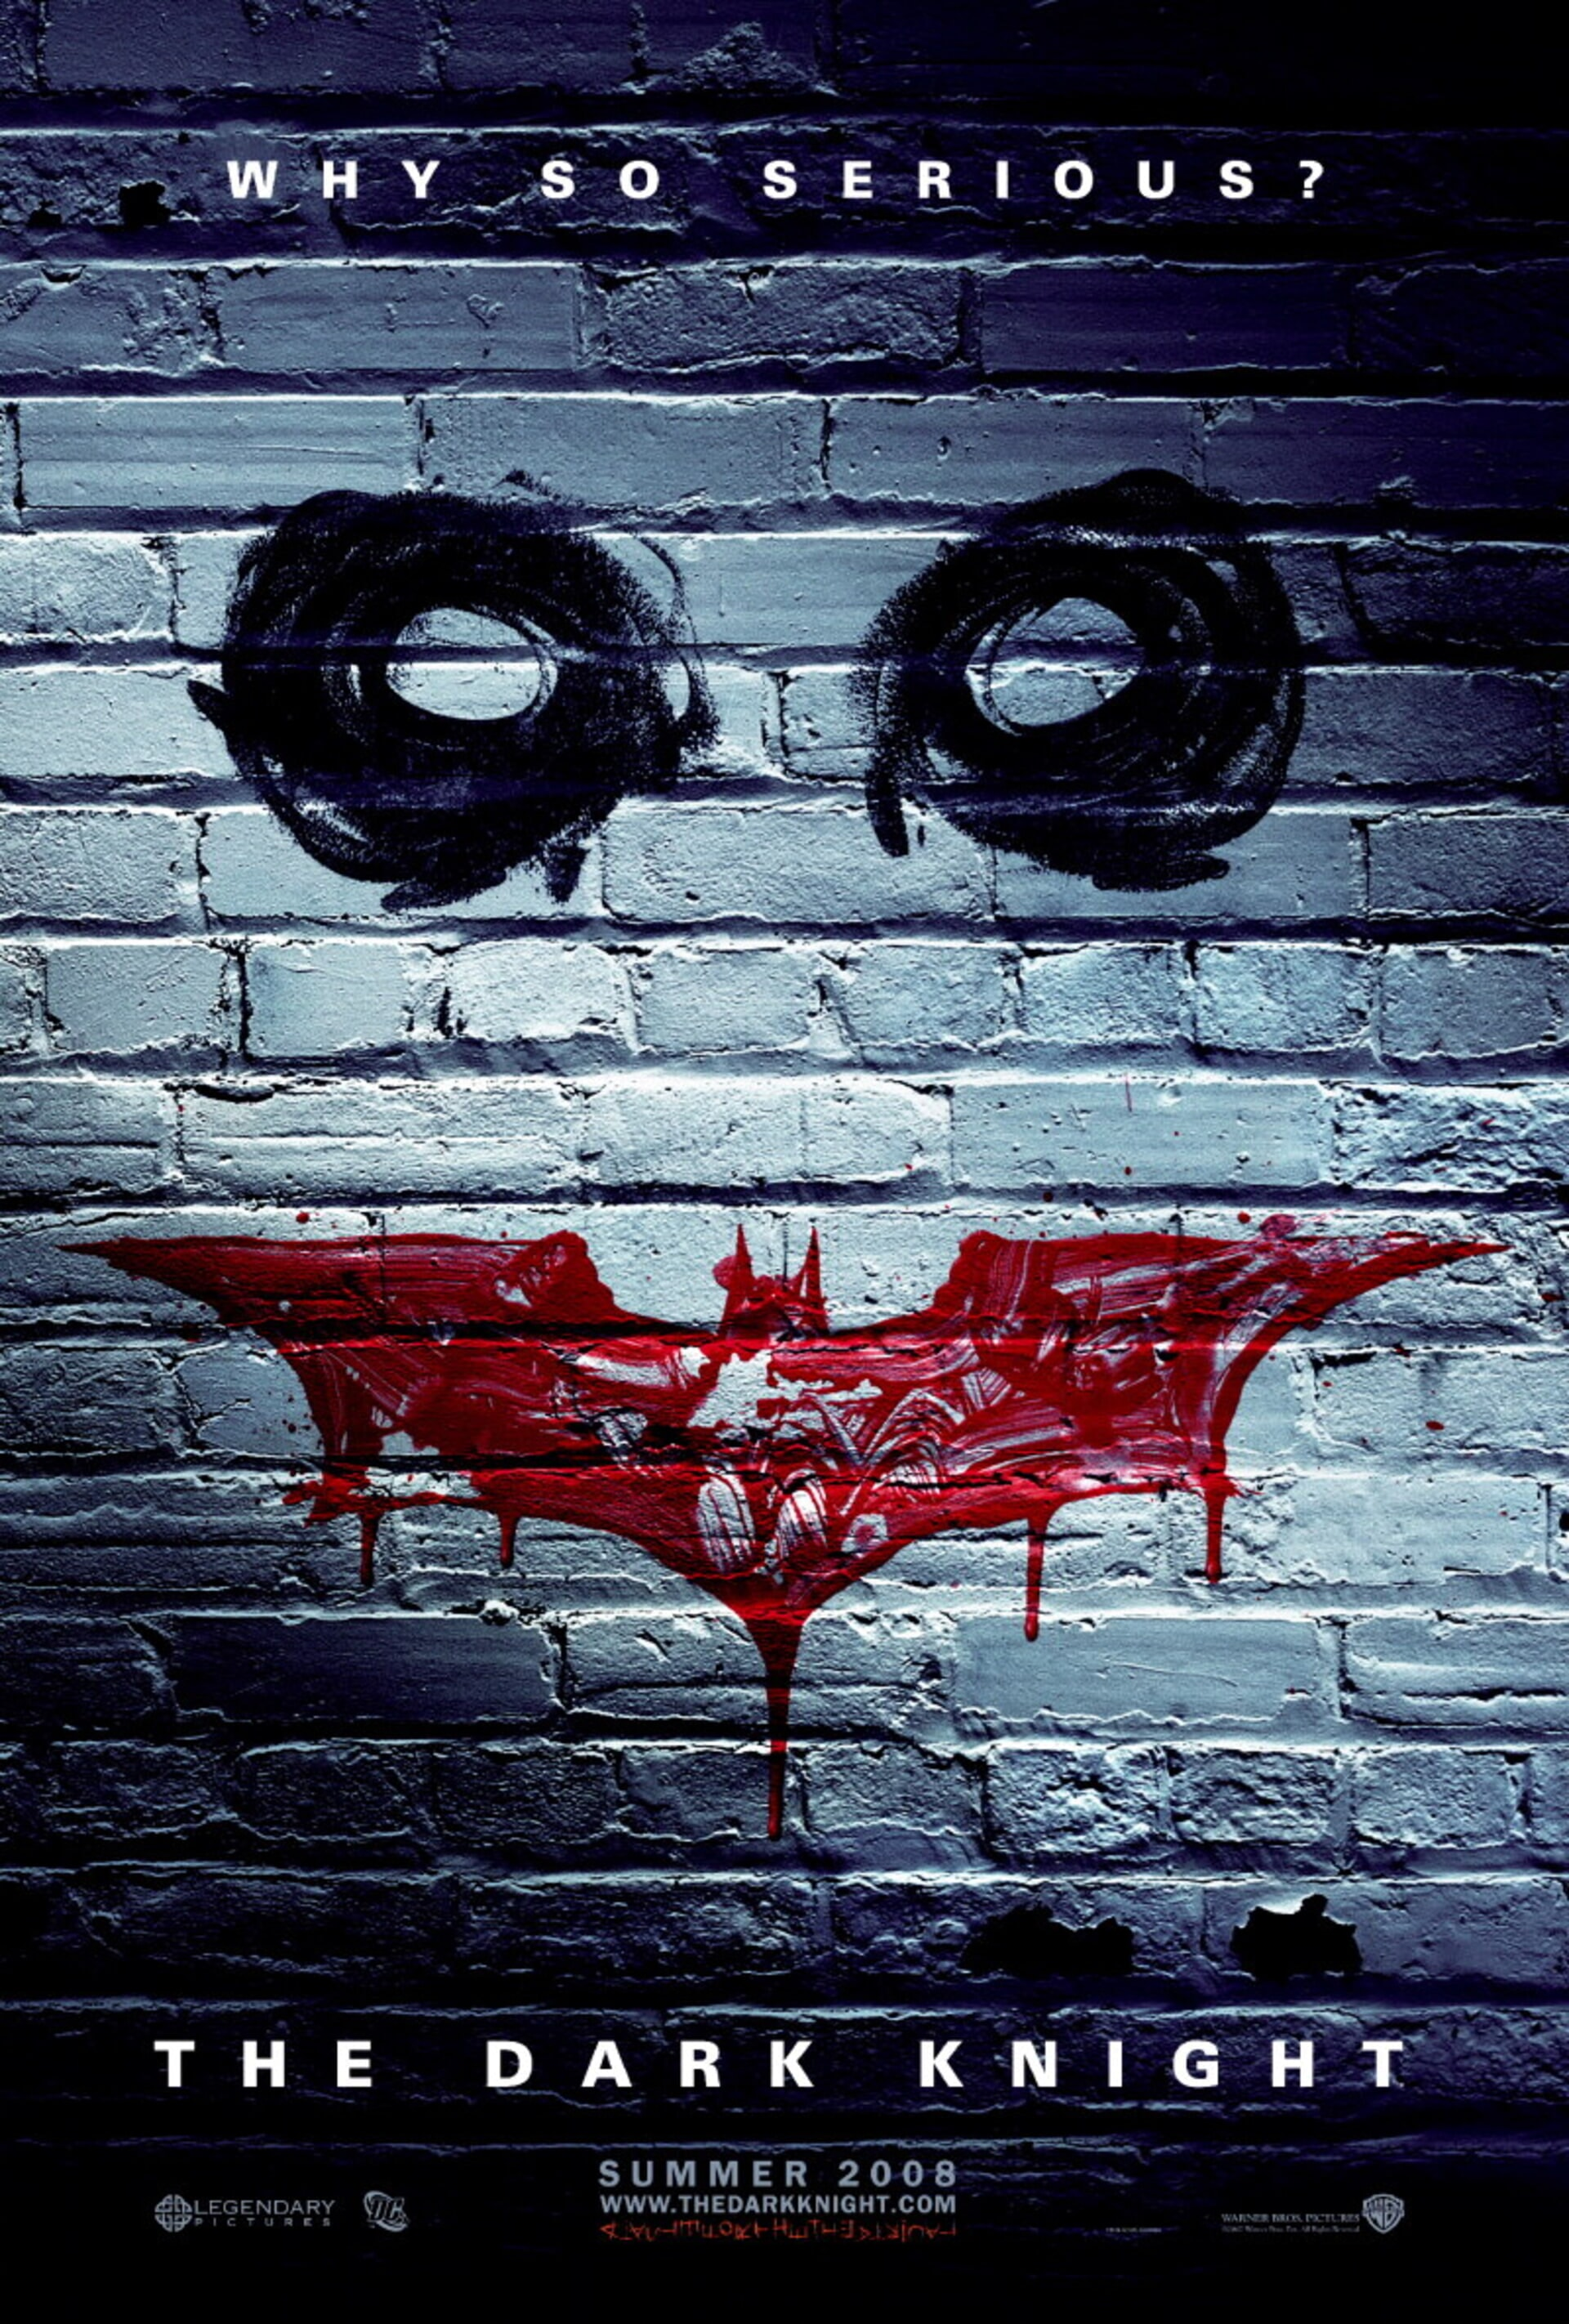 The Dark Knight - Poster 3